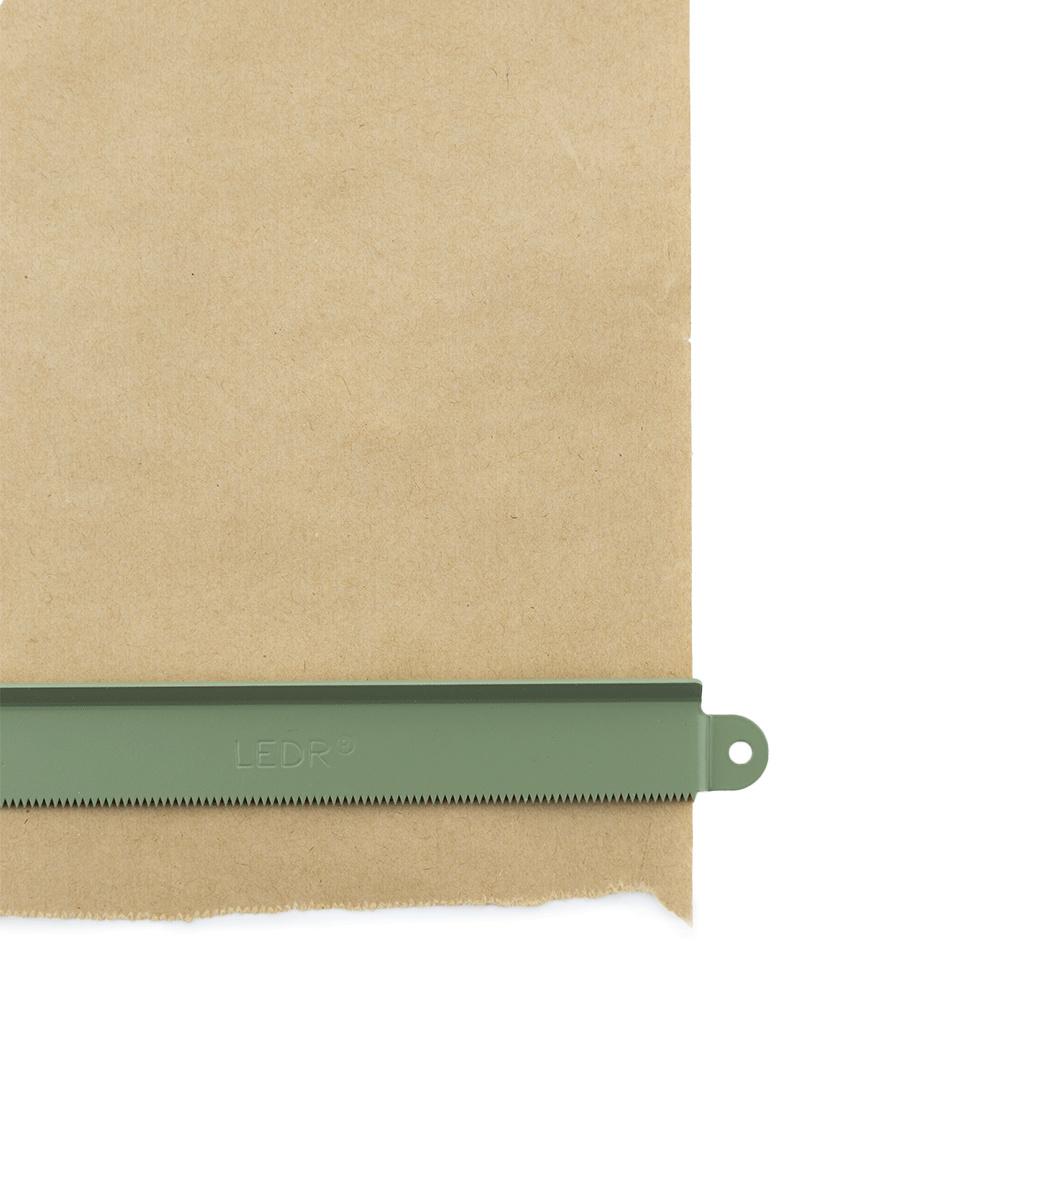 Kraft paper roller L - Green-4